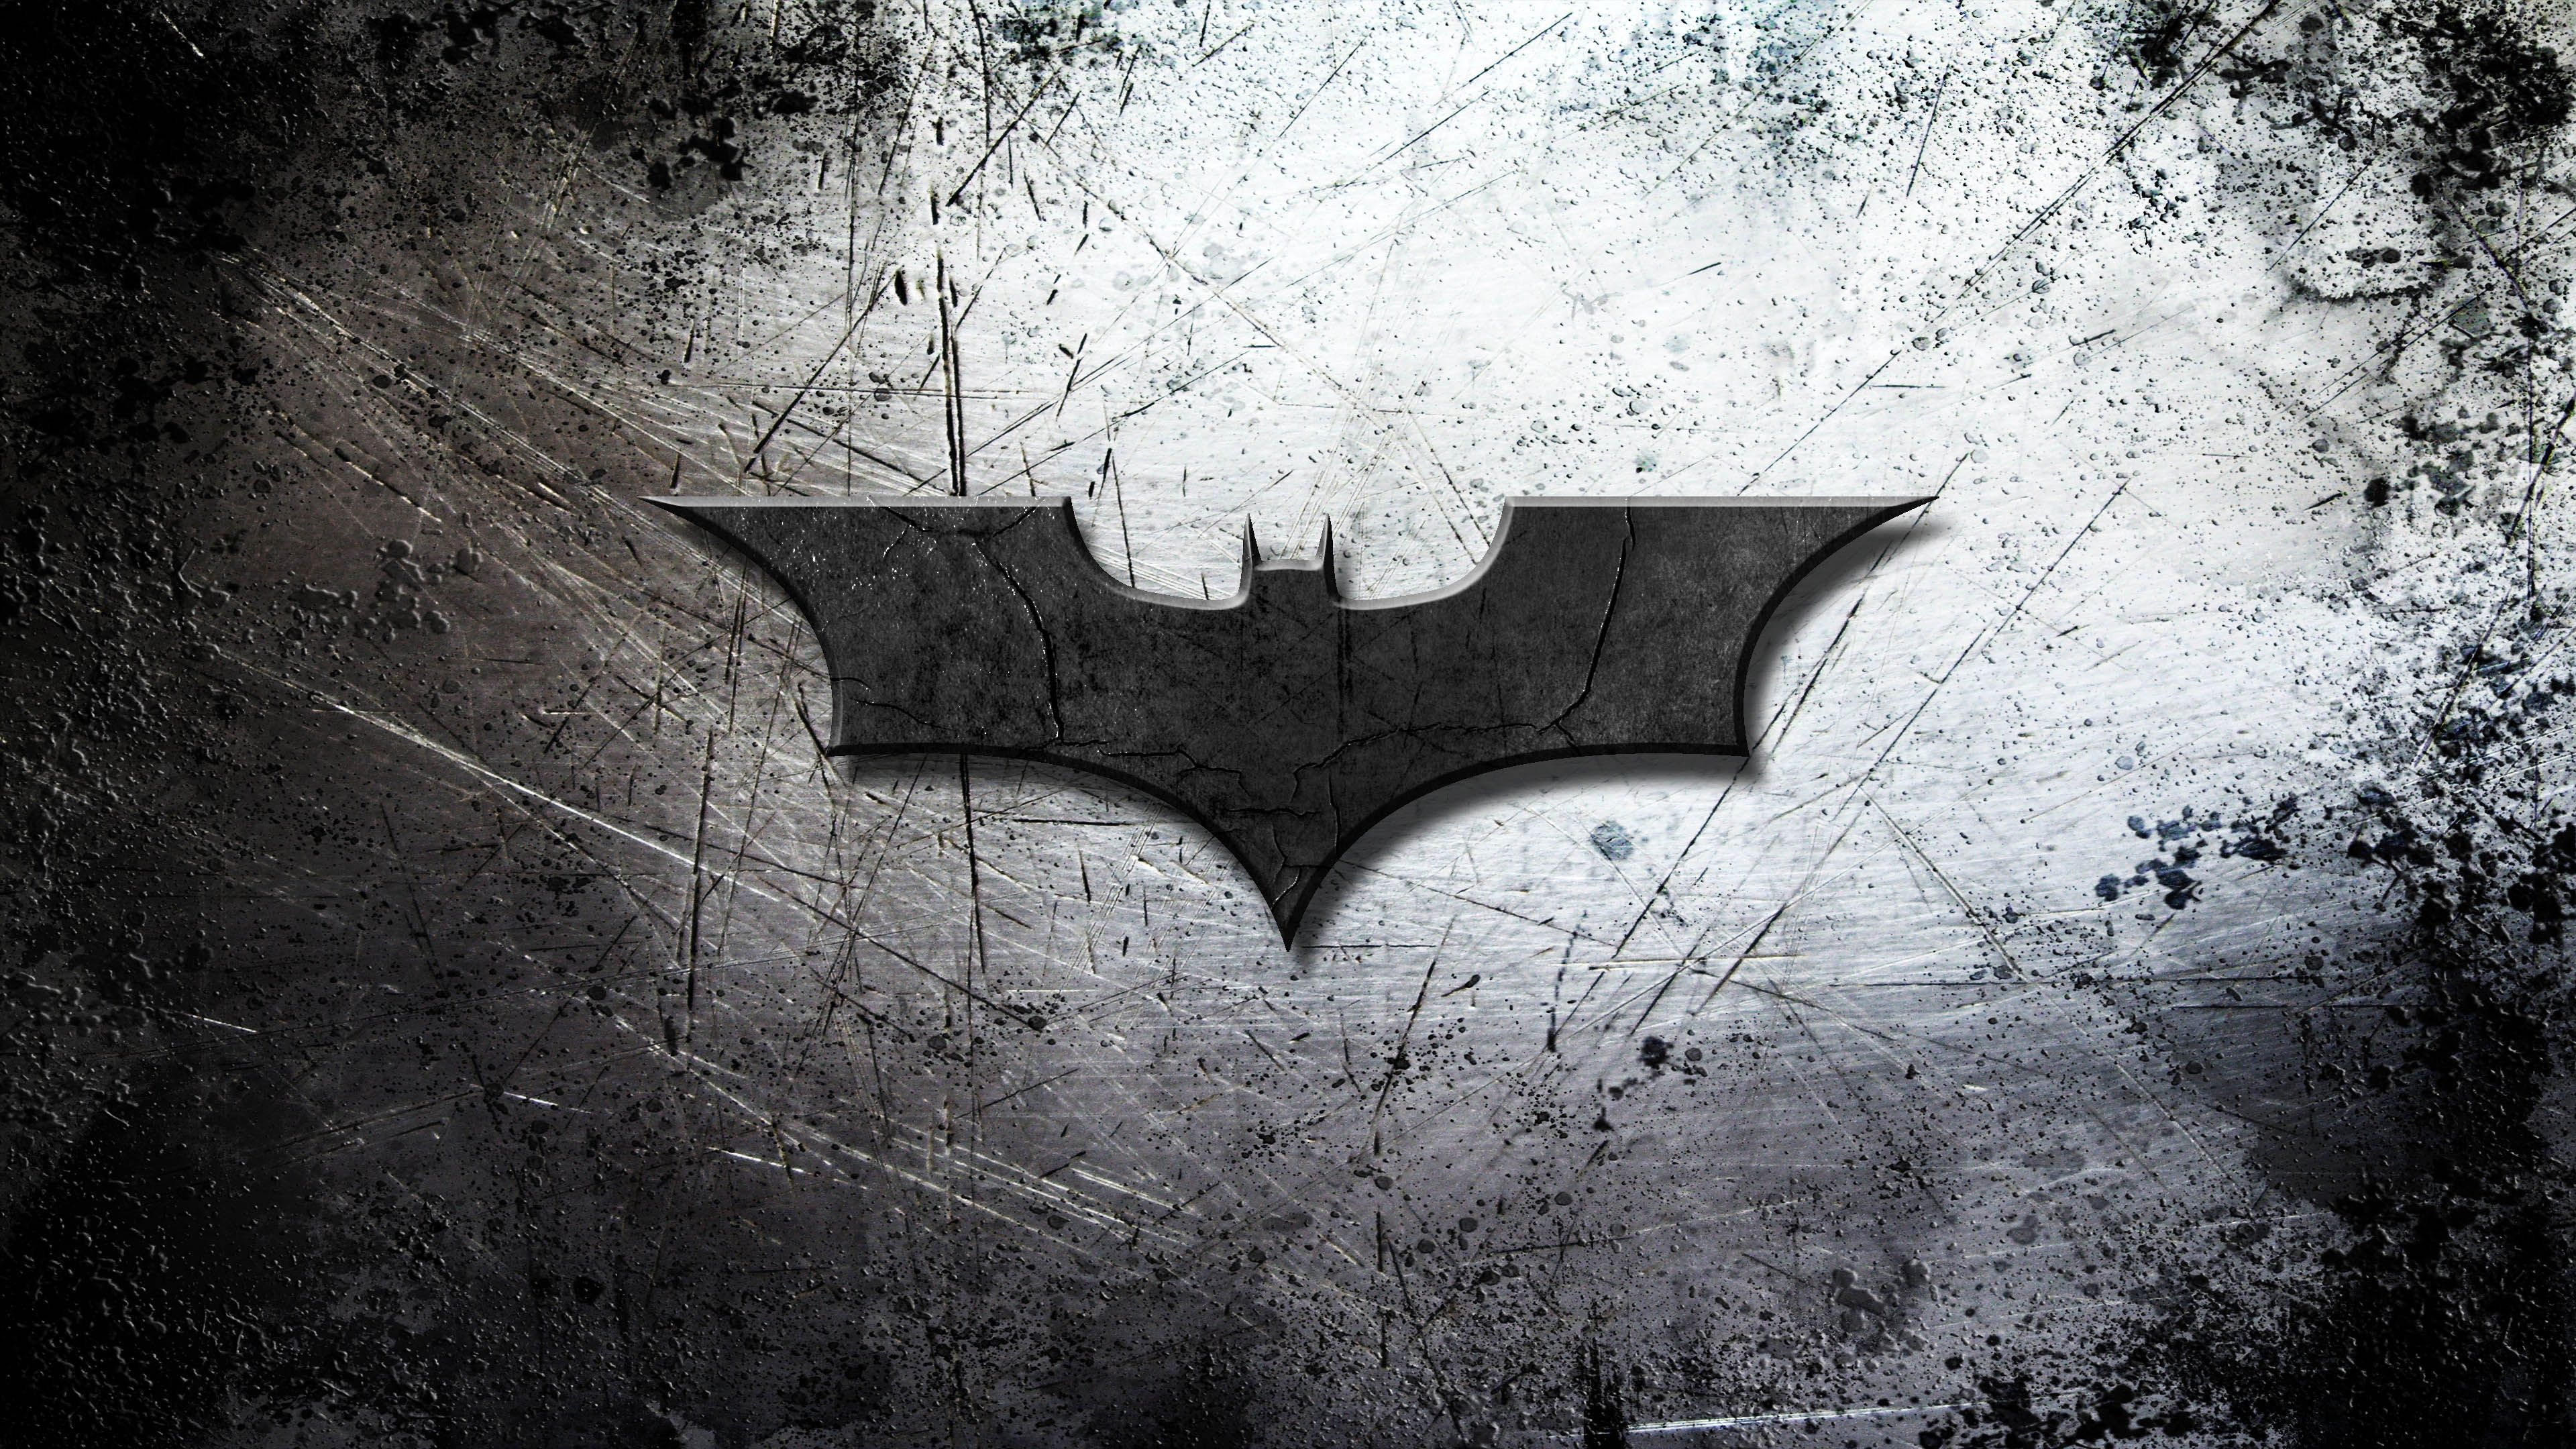 Batman Logo Hd Wallpapers Wallpapers Backgrounds Images Art Photos Hd Batman Wallpaper Batman Backgrounds Batman Wallpaper Batman dark knight logo wallpaper hd